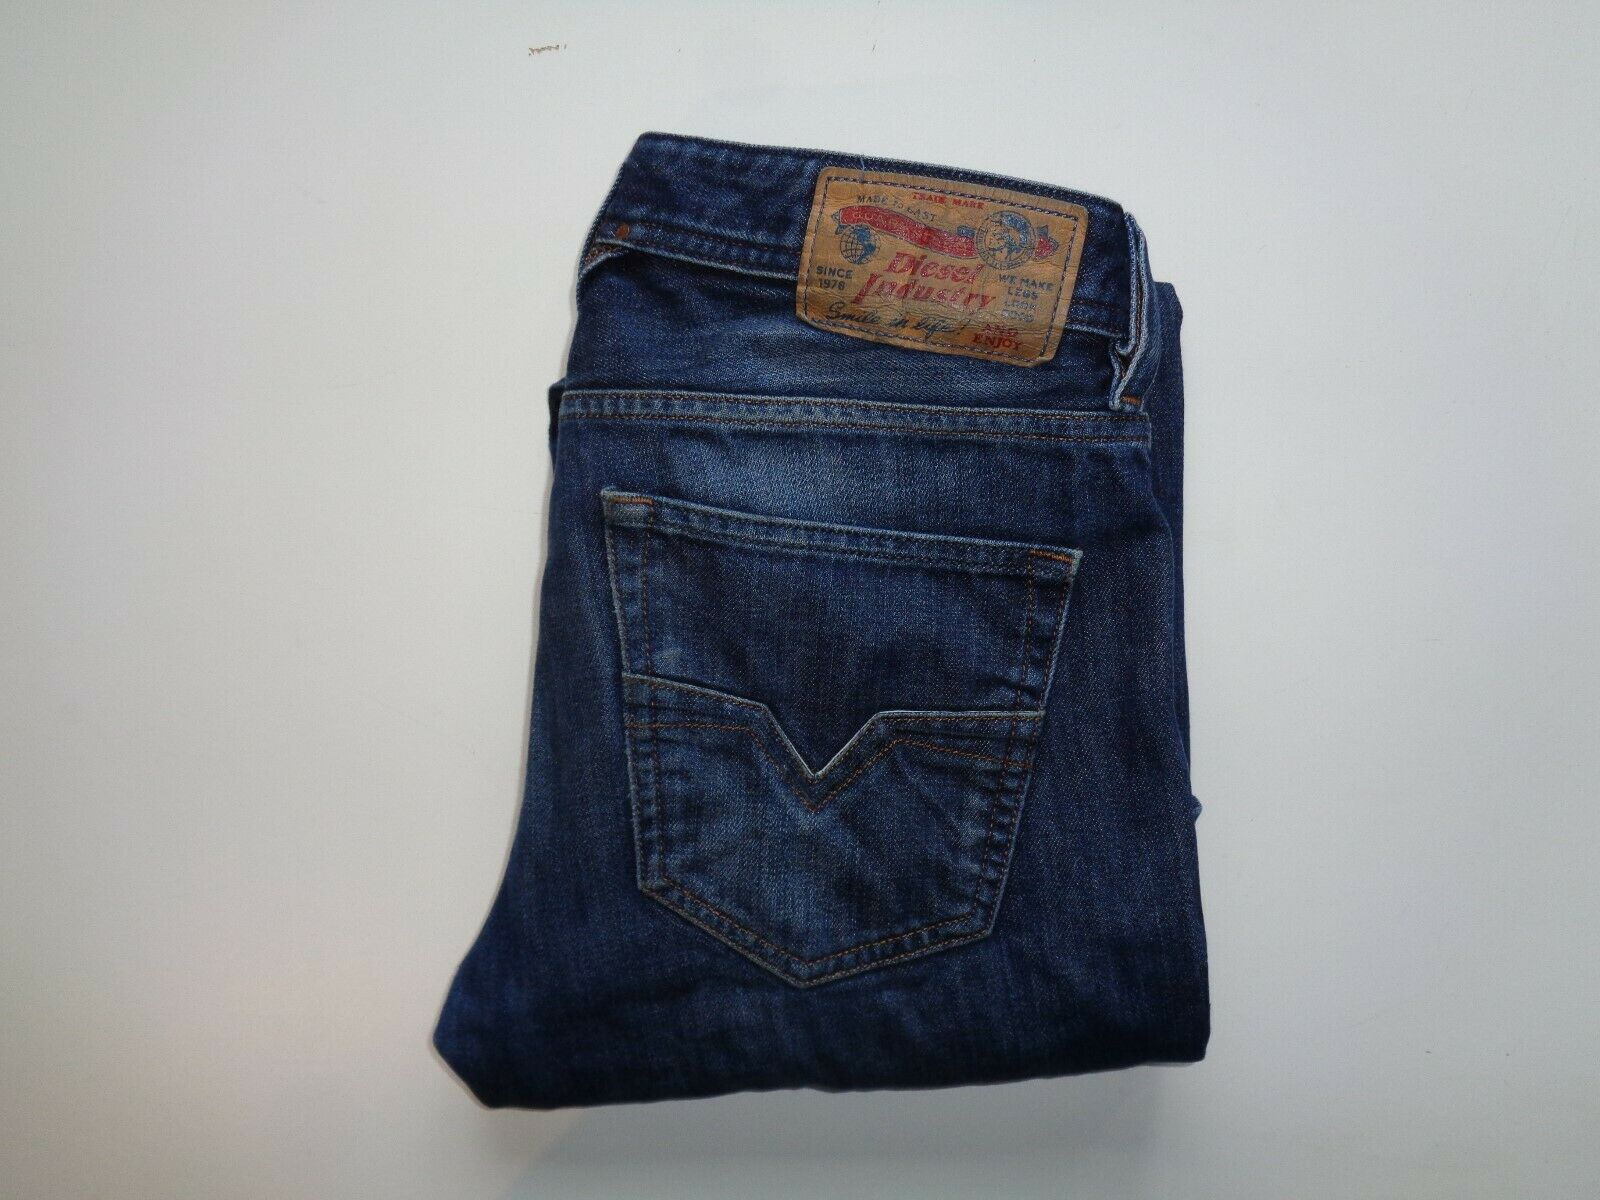 DIESEL Larkee 0823G Dark blu Jeans Girovita 28  X Gamba 28  Da Uomo Regolare Dritto